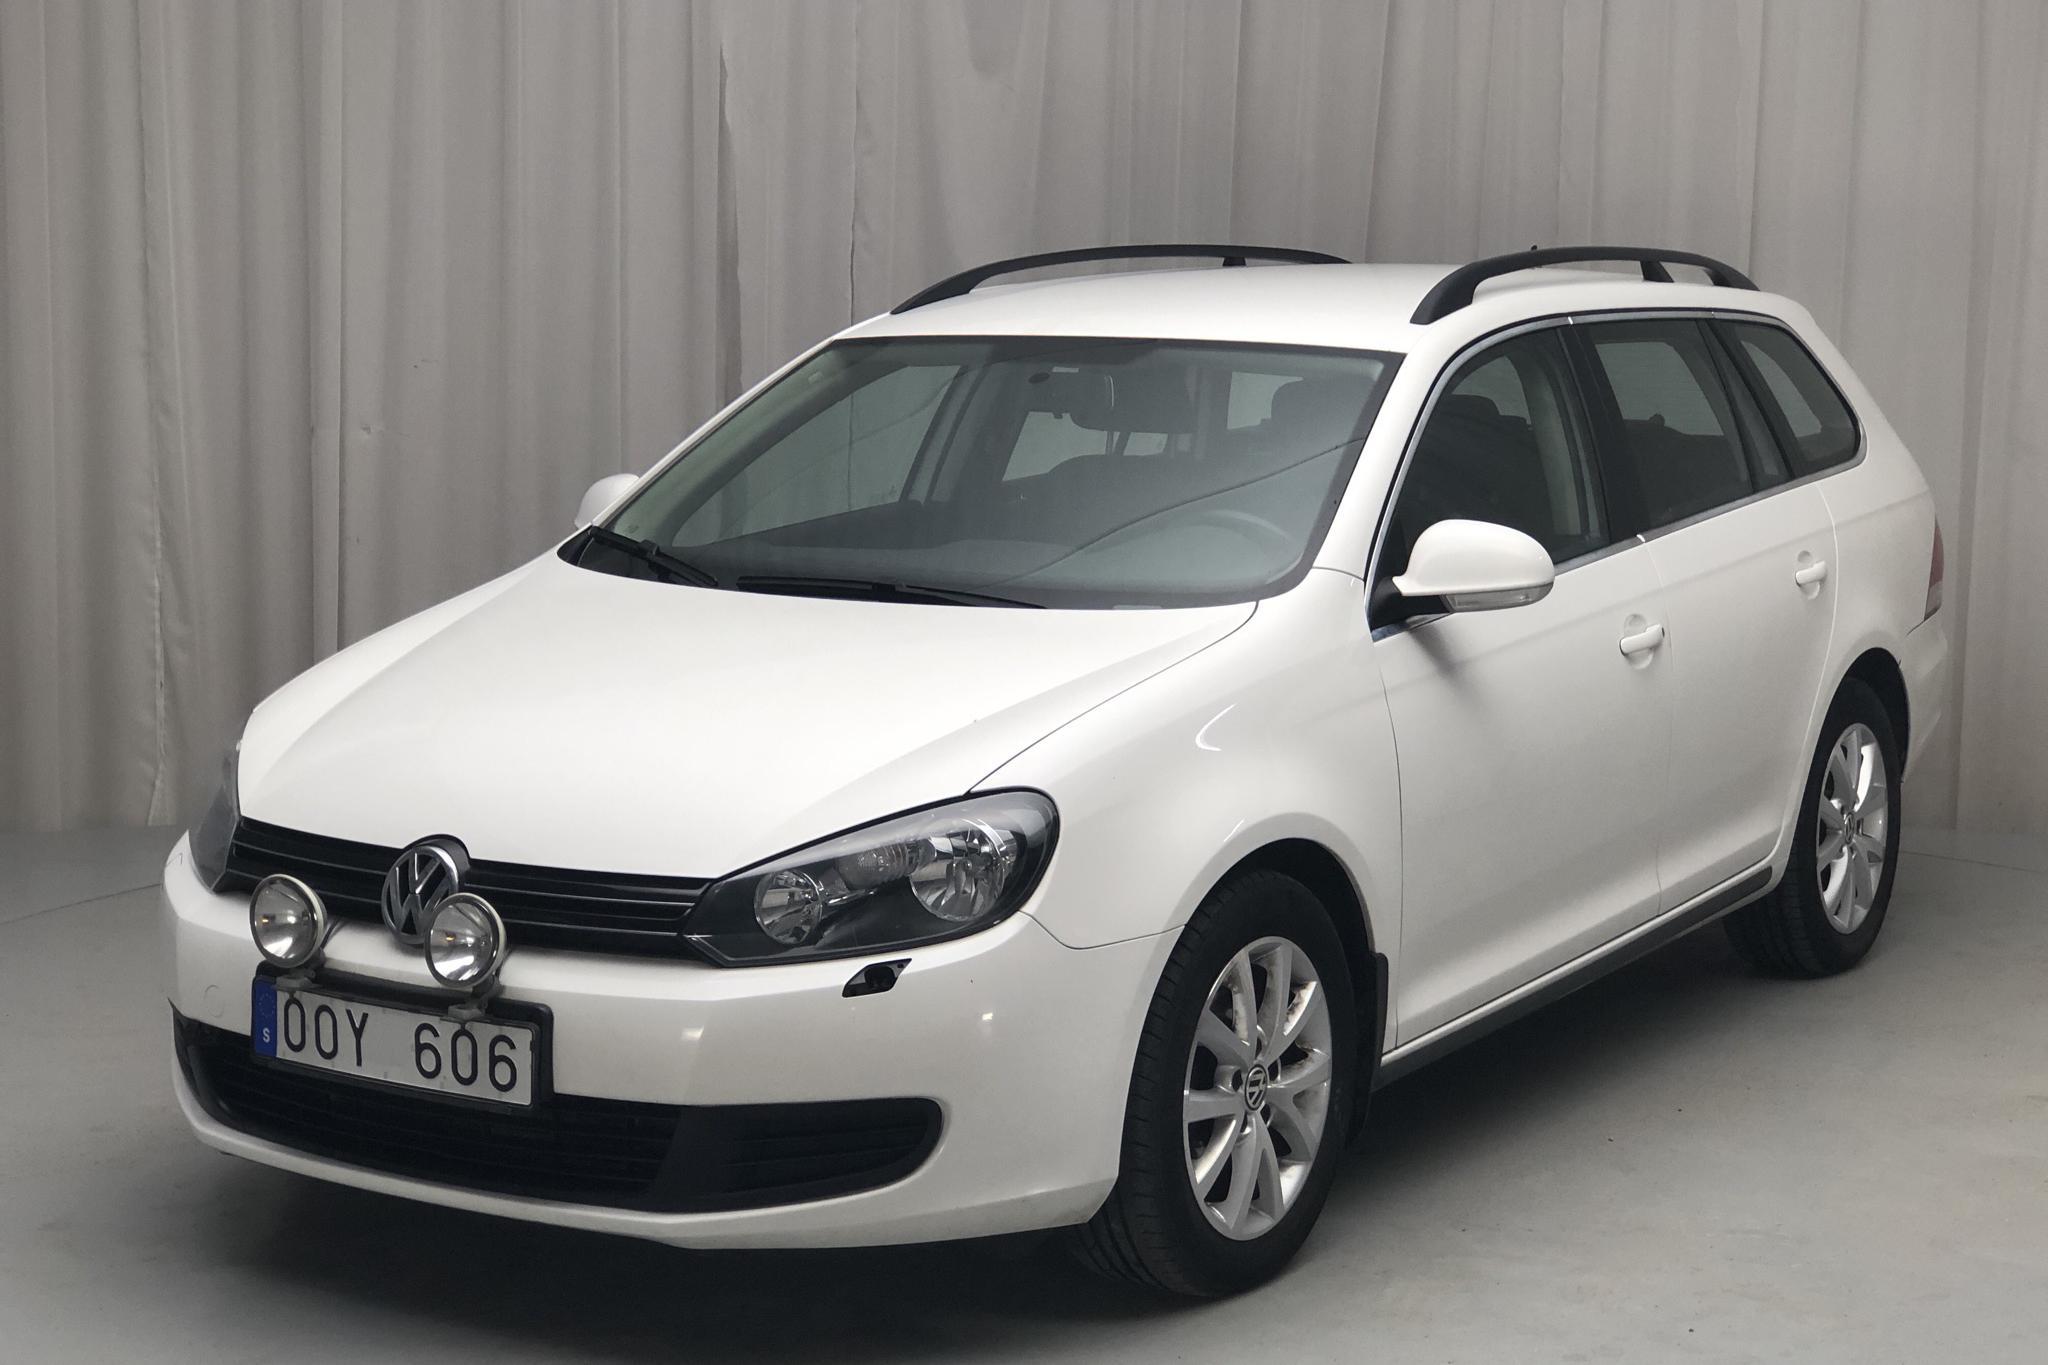 VW Golf VI 1.6 TDI BlueMotion Technology Variant (105hk) - 110 700 km - Automatic - white - 2011